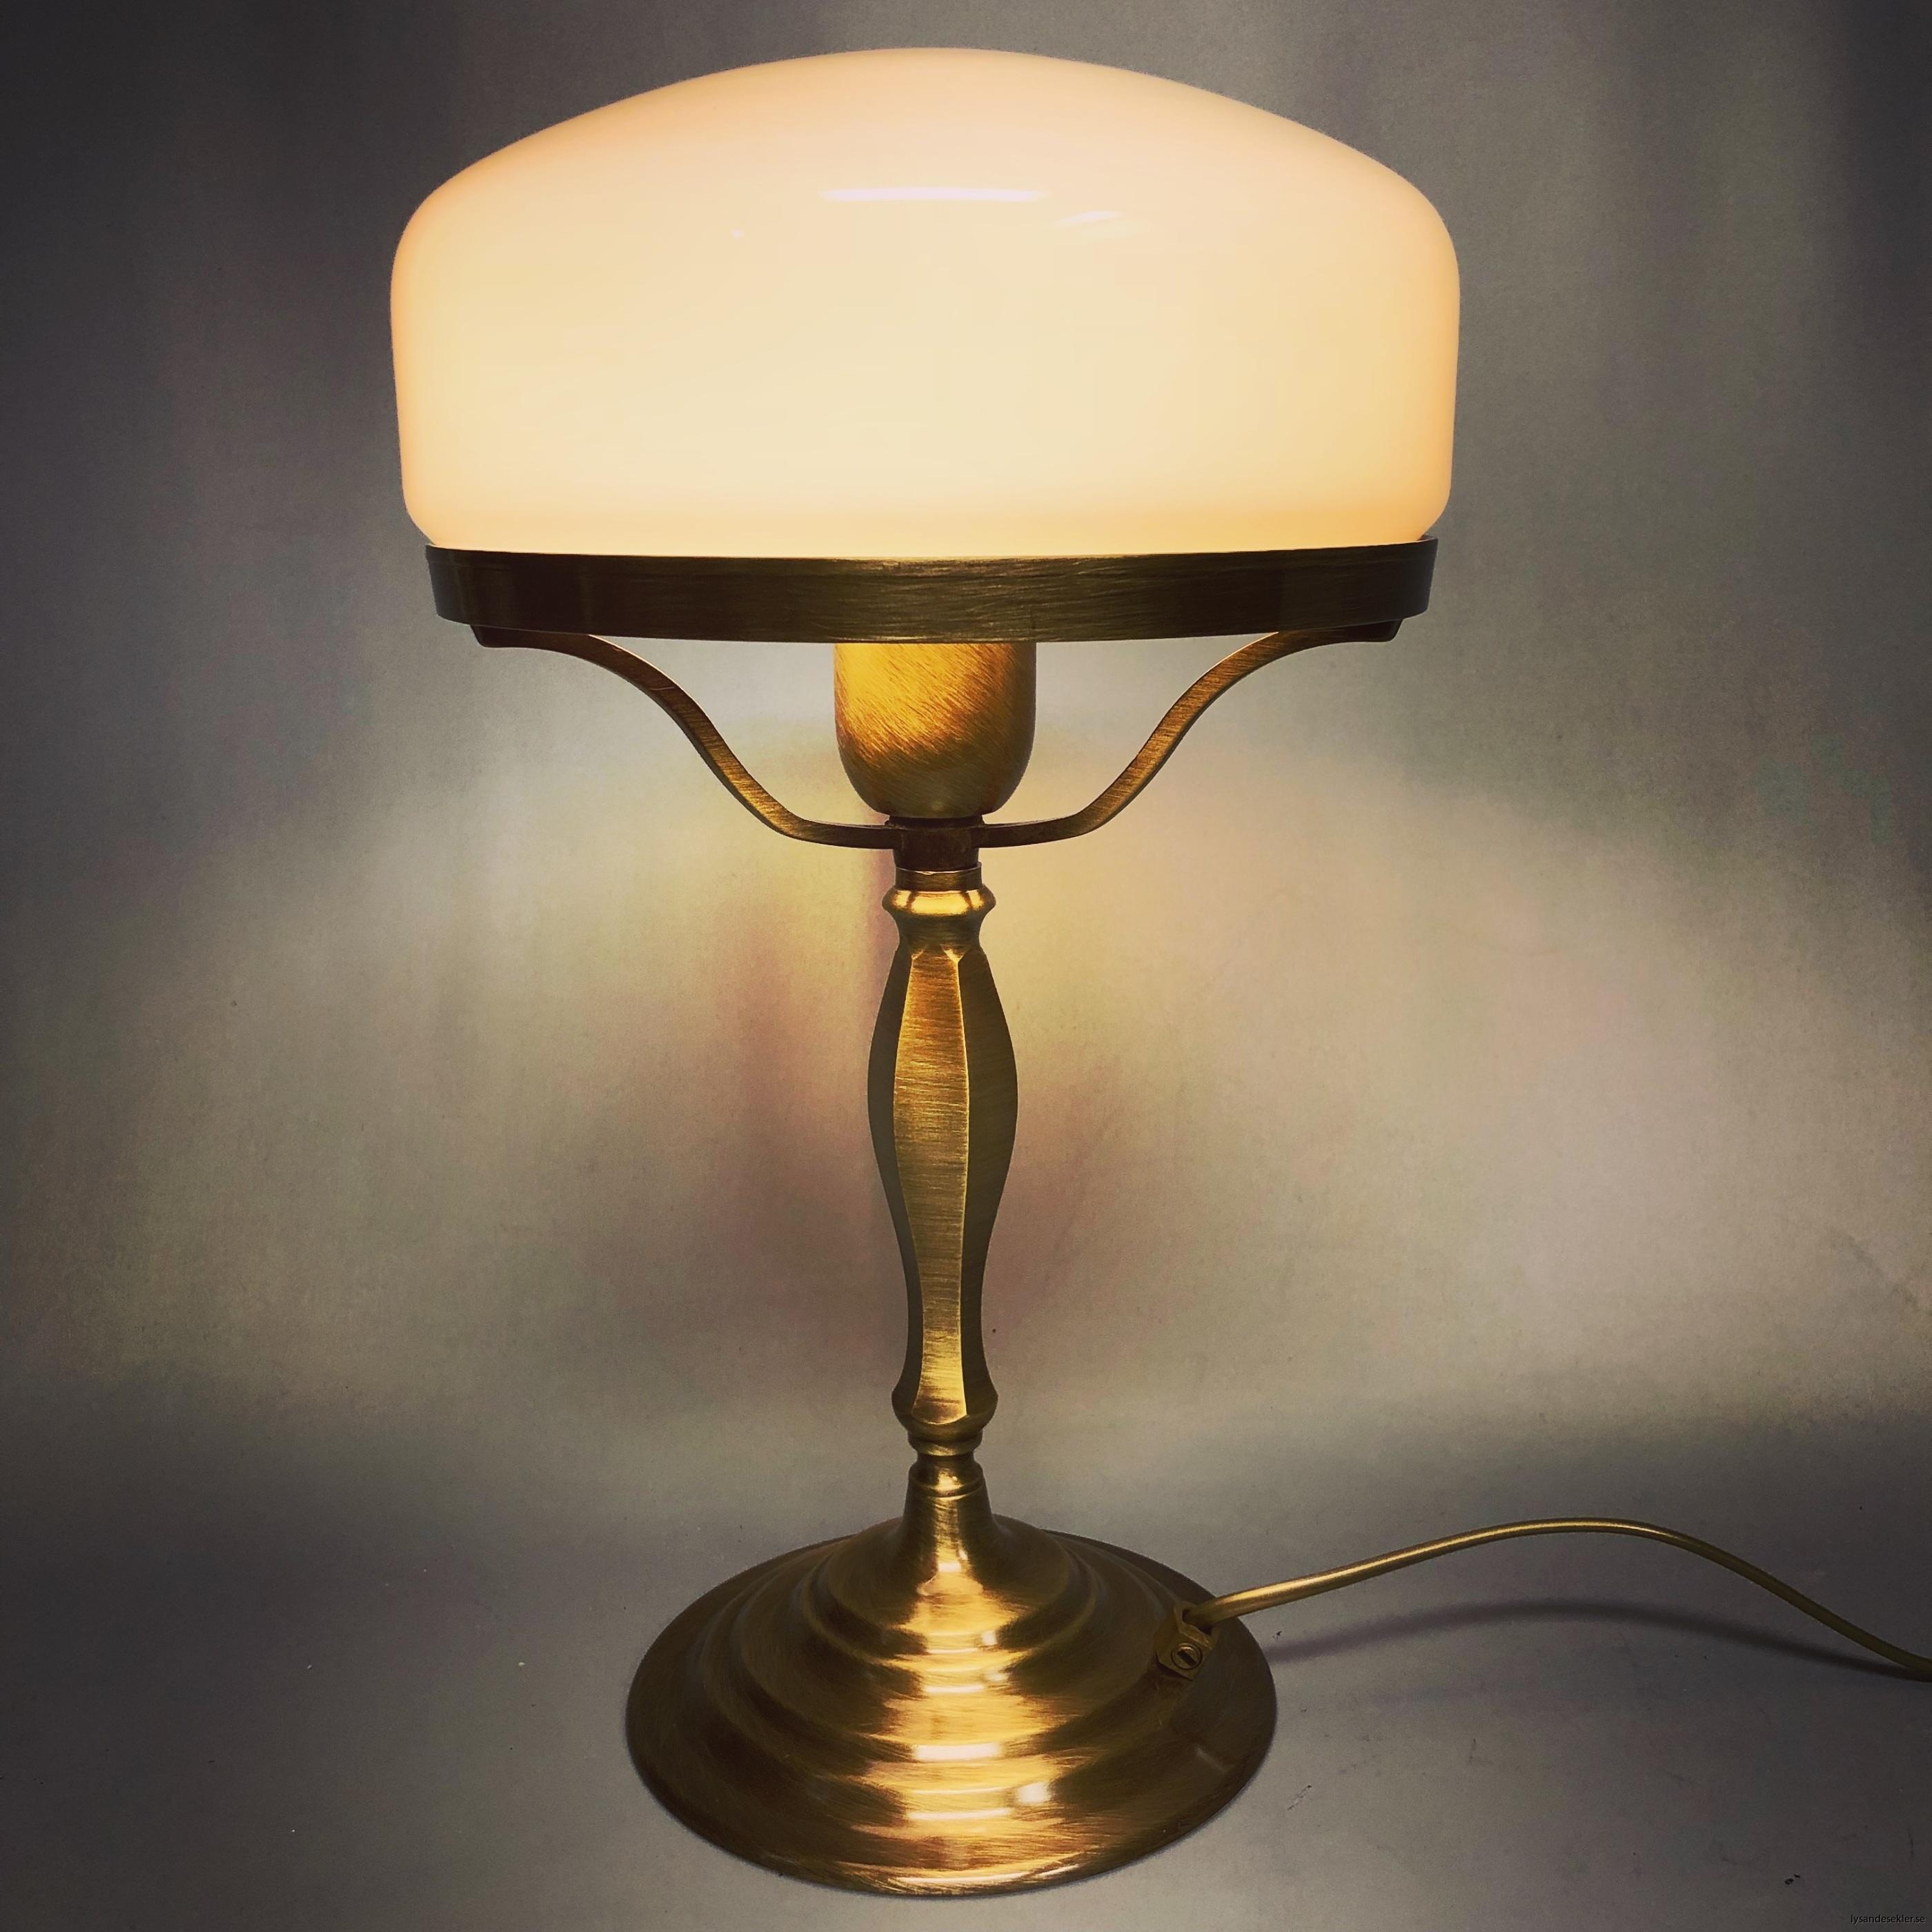 strindbergslampa strindbergslampor strindberg lampa skärm kupa strindbergsskärm strindbergskupa12